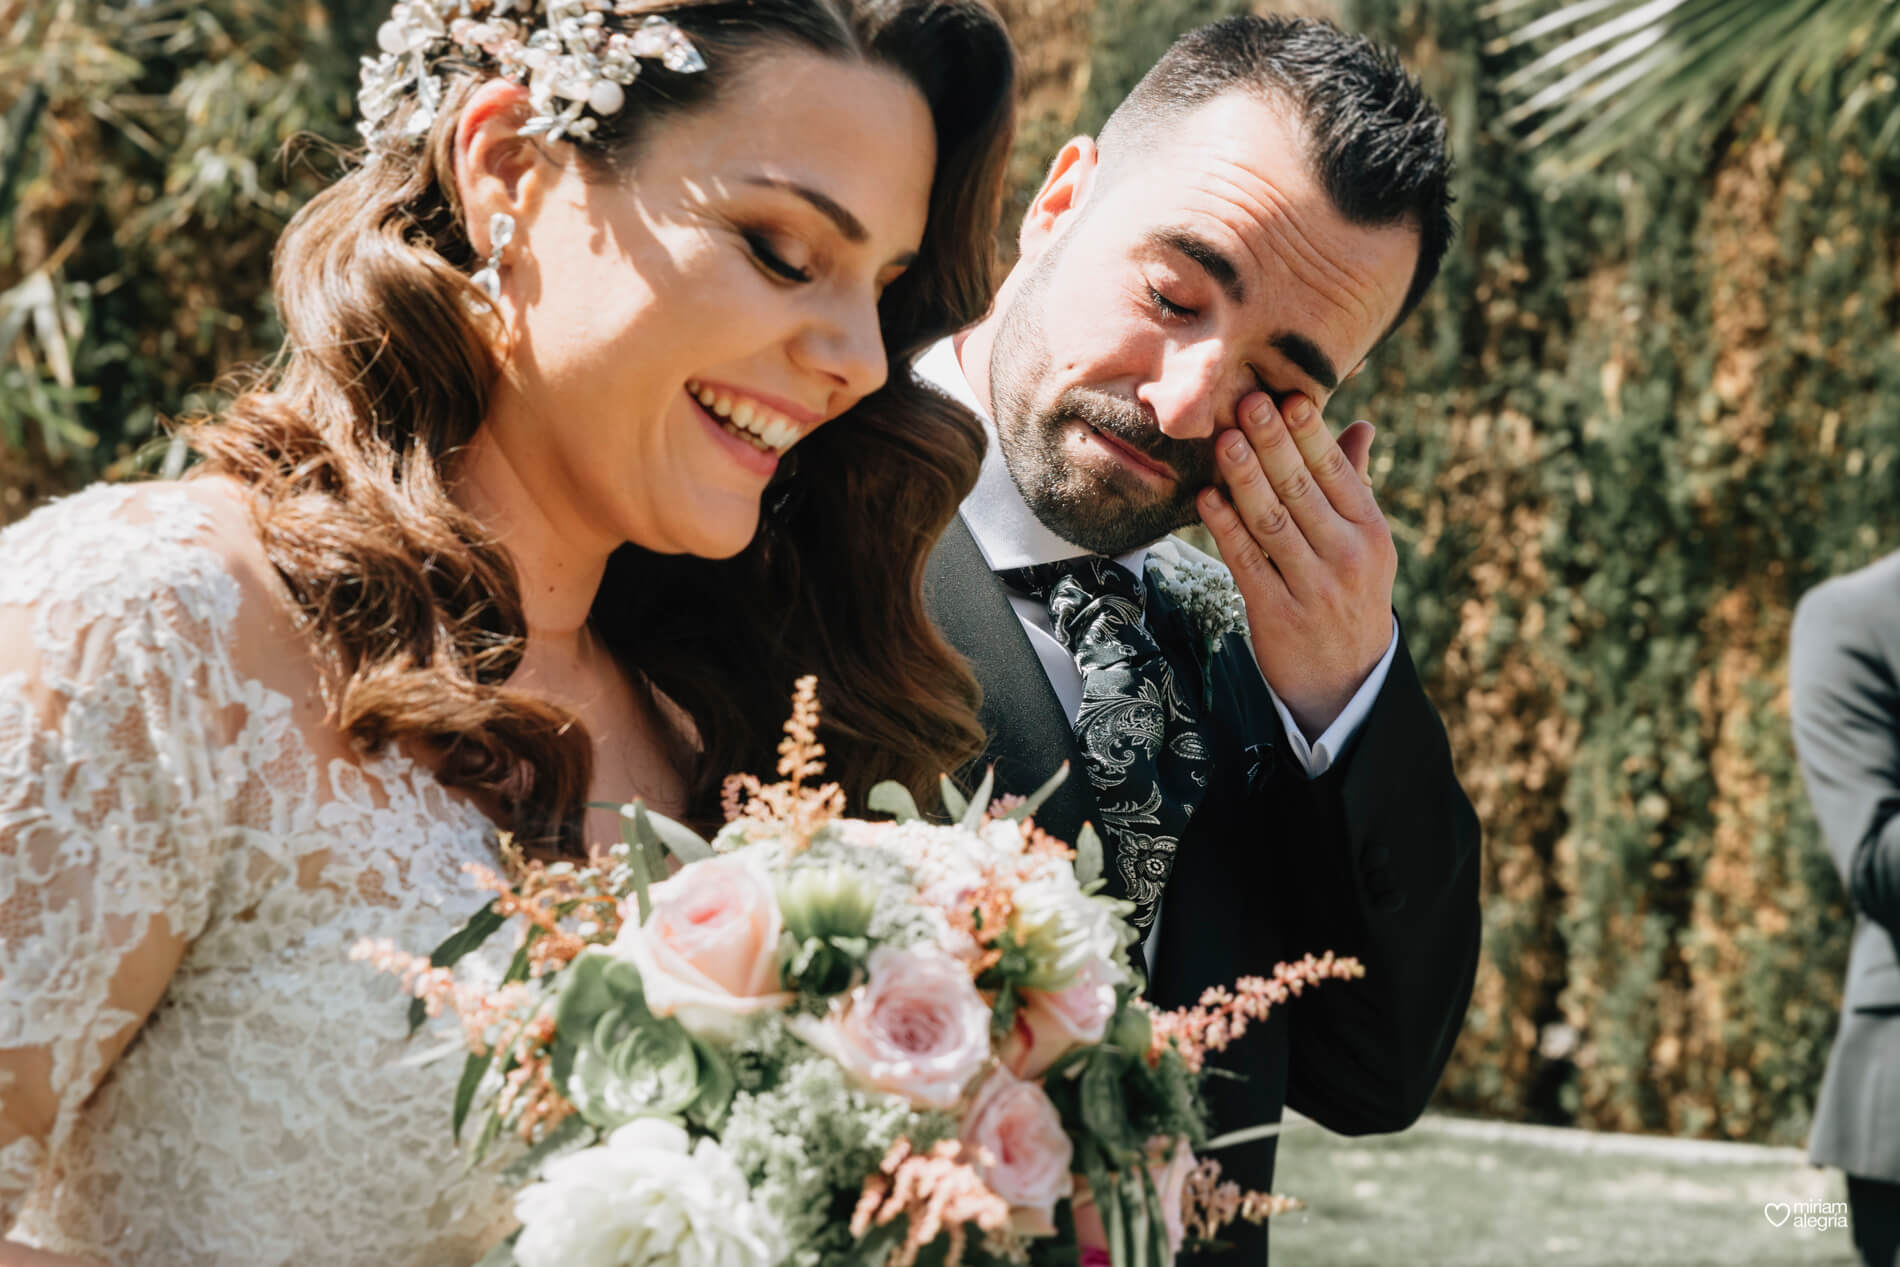 boda-en-finca-jurosa-miriam-alegria-49